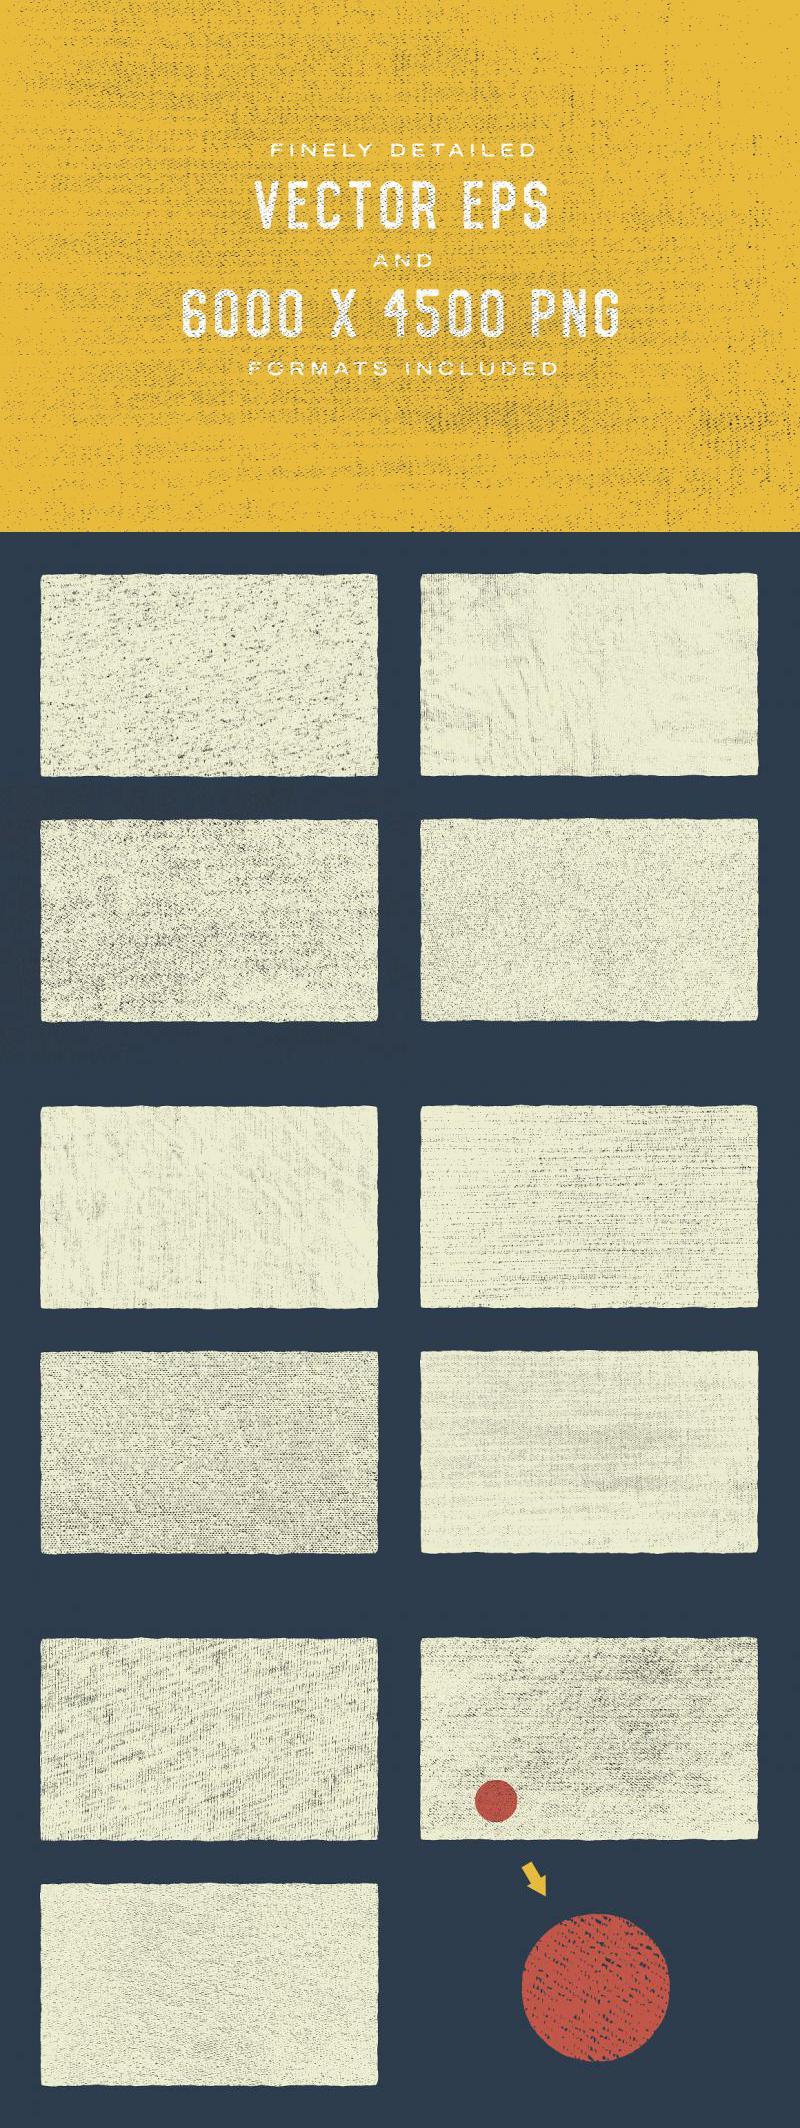 10 Vintage Fabric Textures